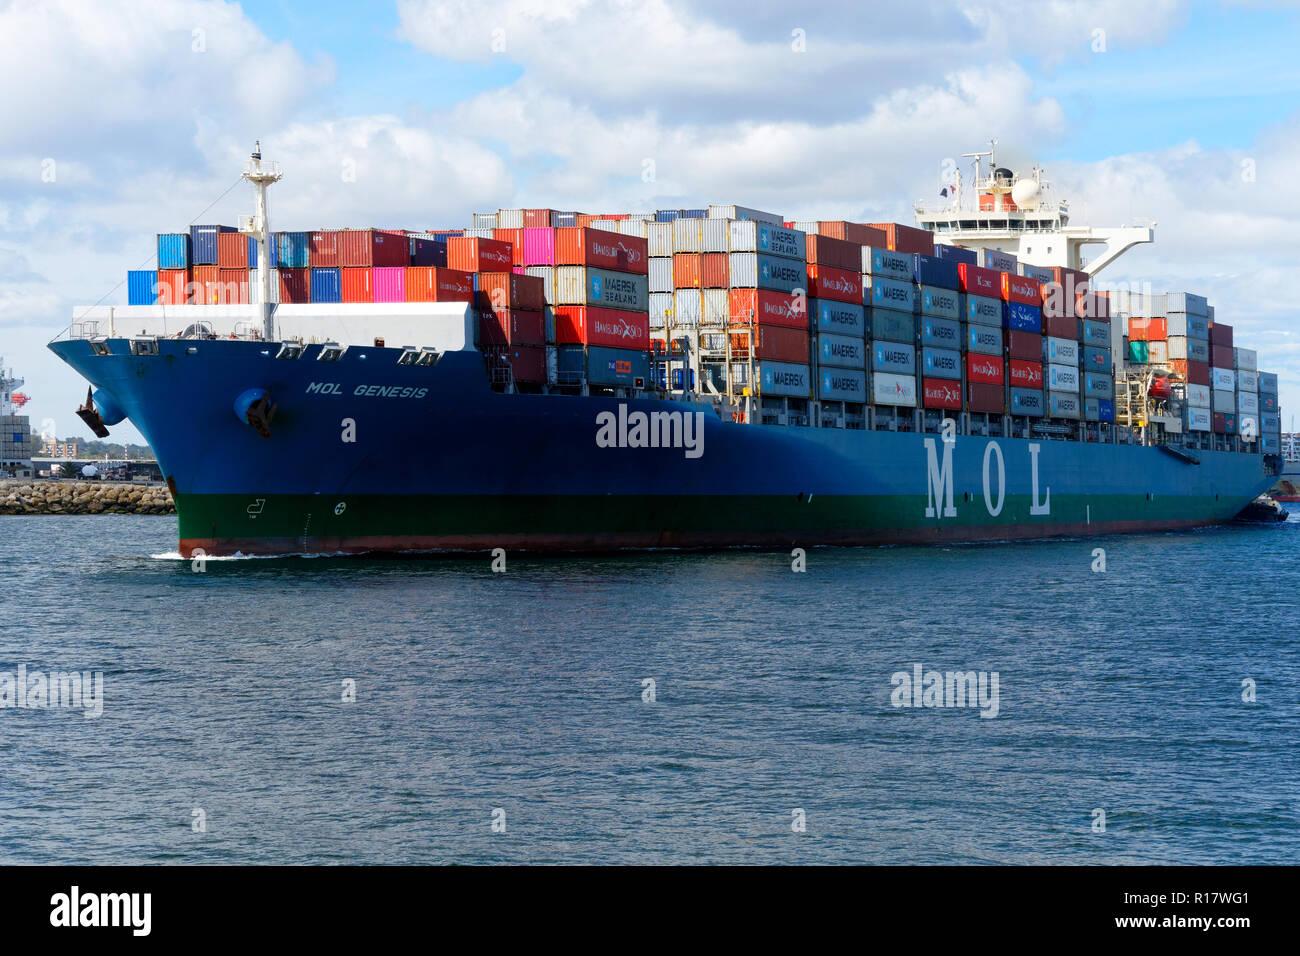 Containerschiff Mol Genesis in Fremantle Harbour, Fremantle, Western Australia Stockbild